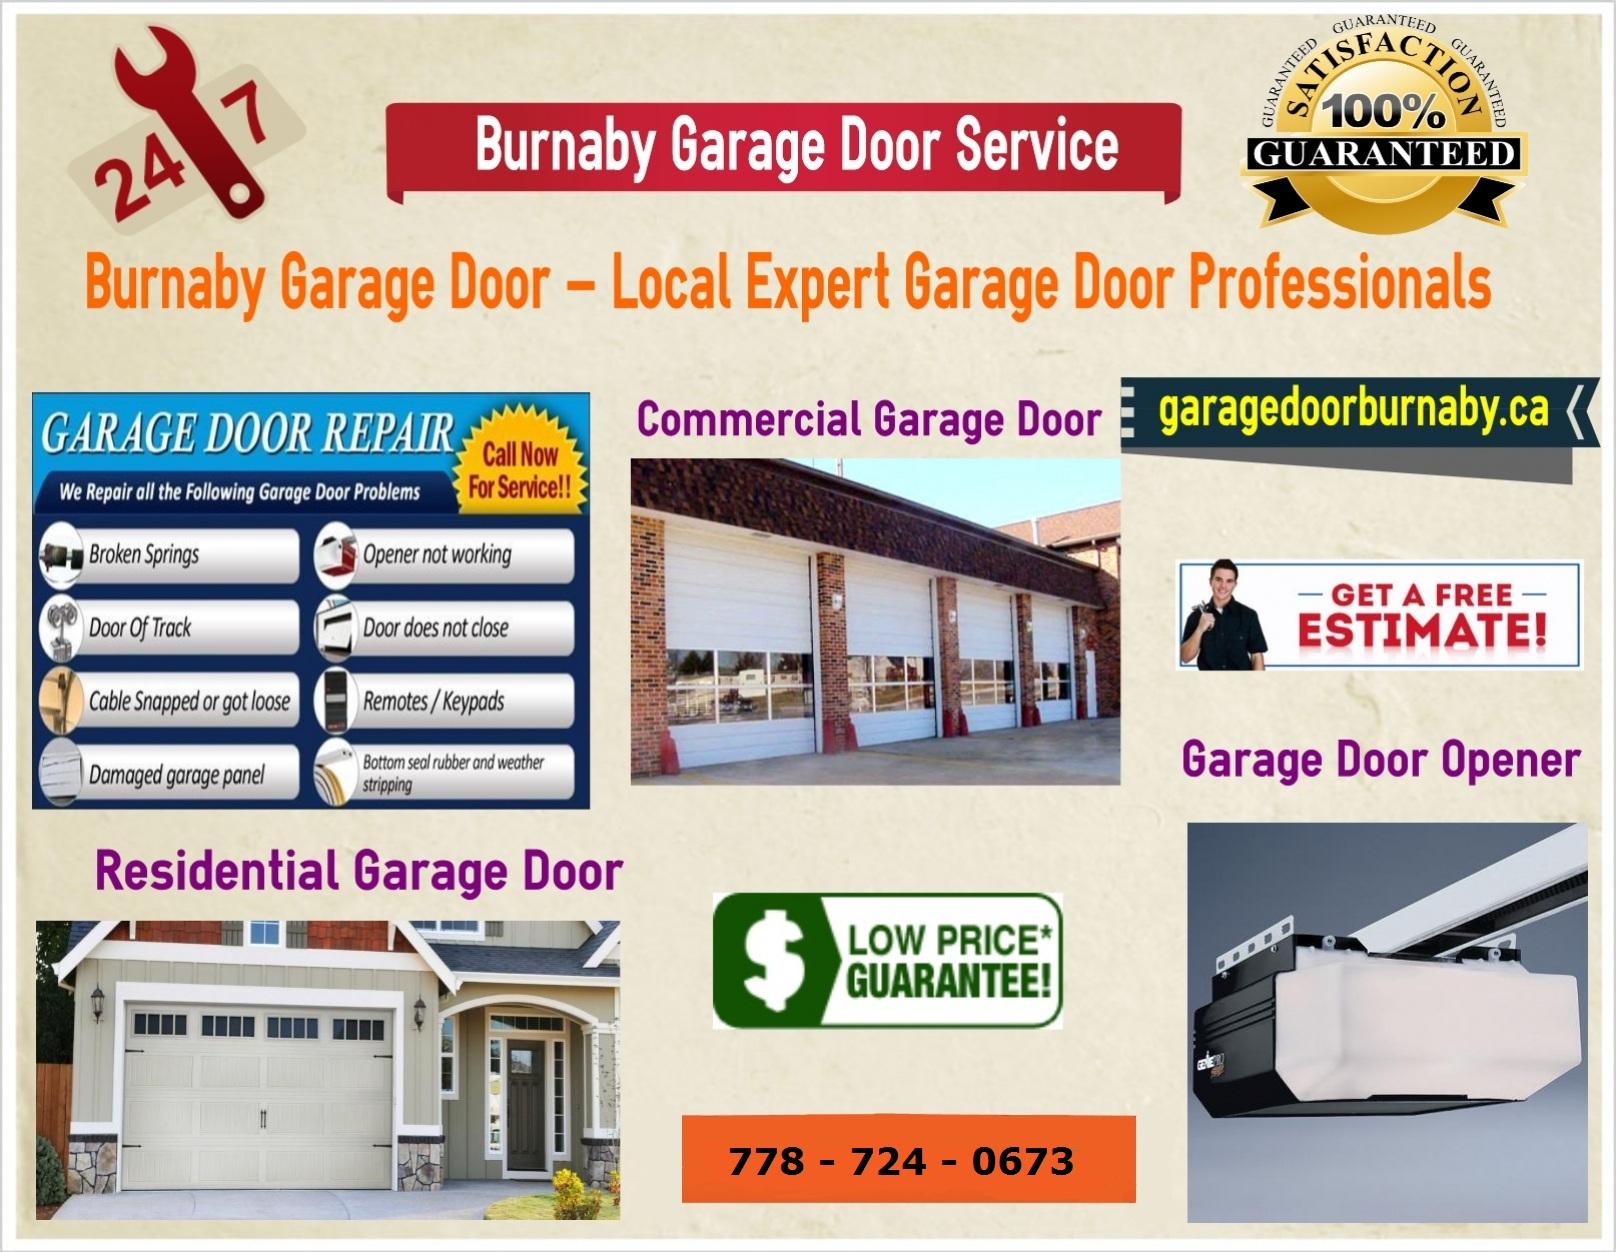 Garage door repair burnaby free images at clker